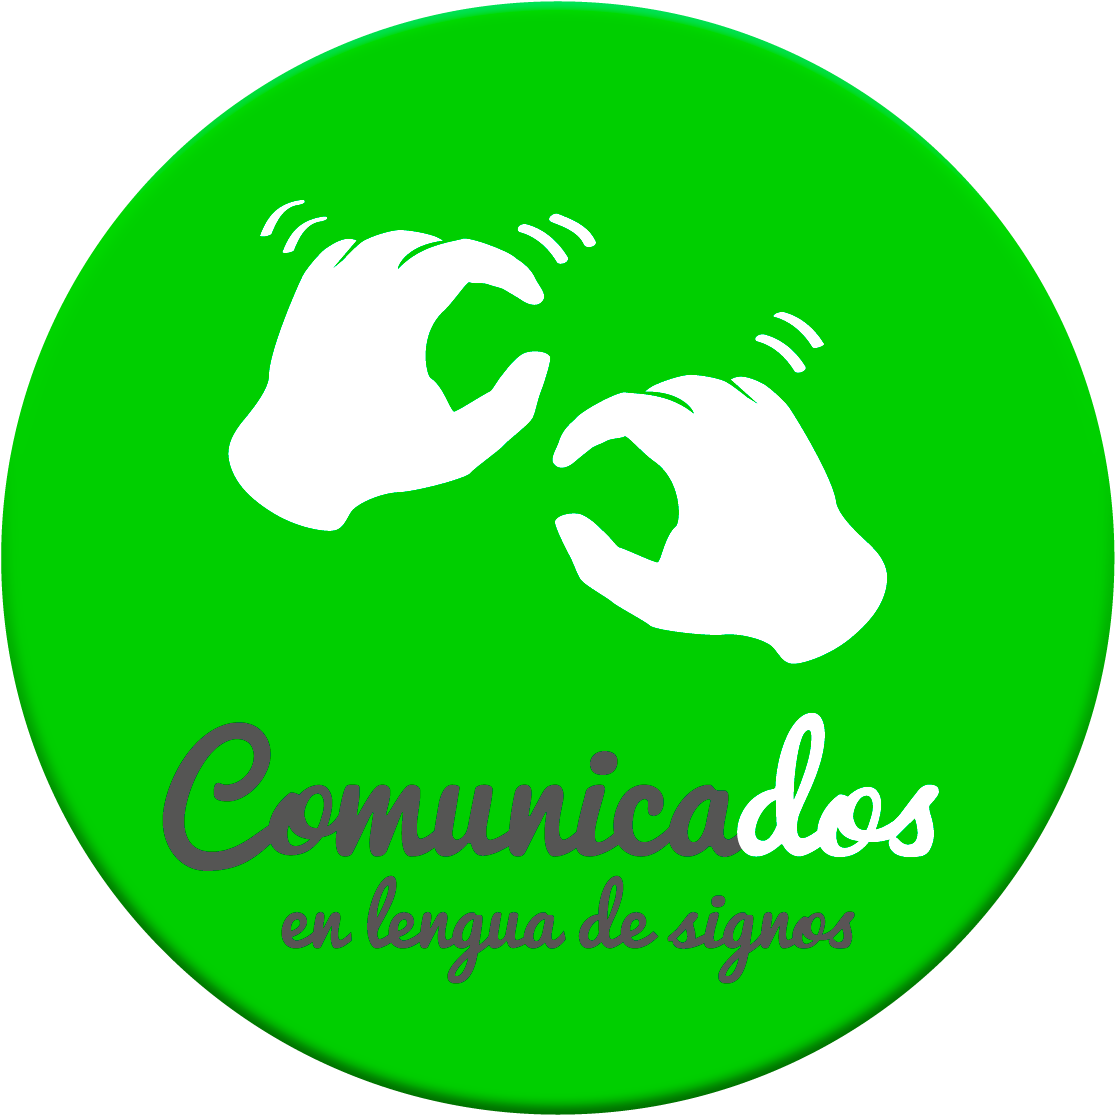 Logo comunicados nuevo